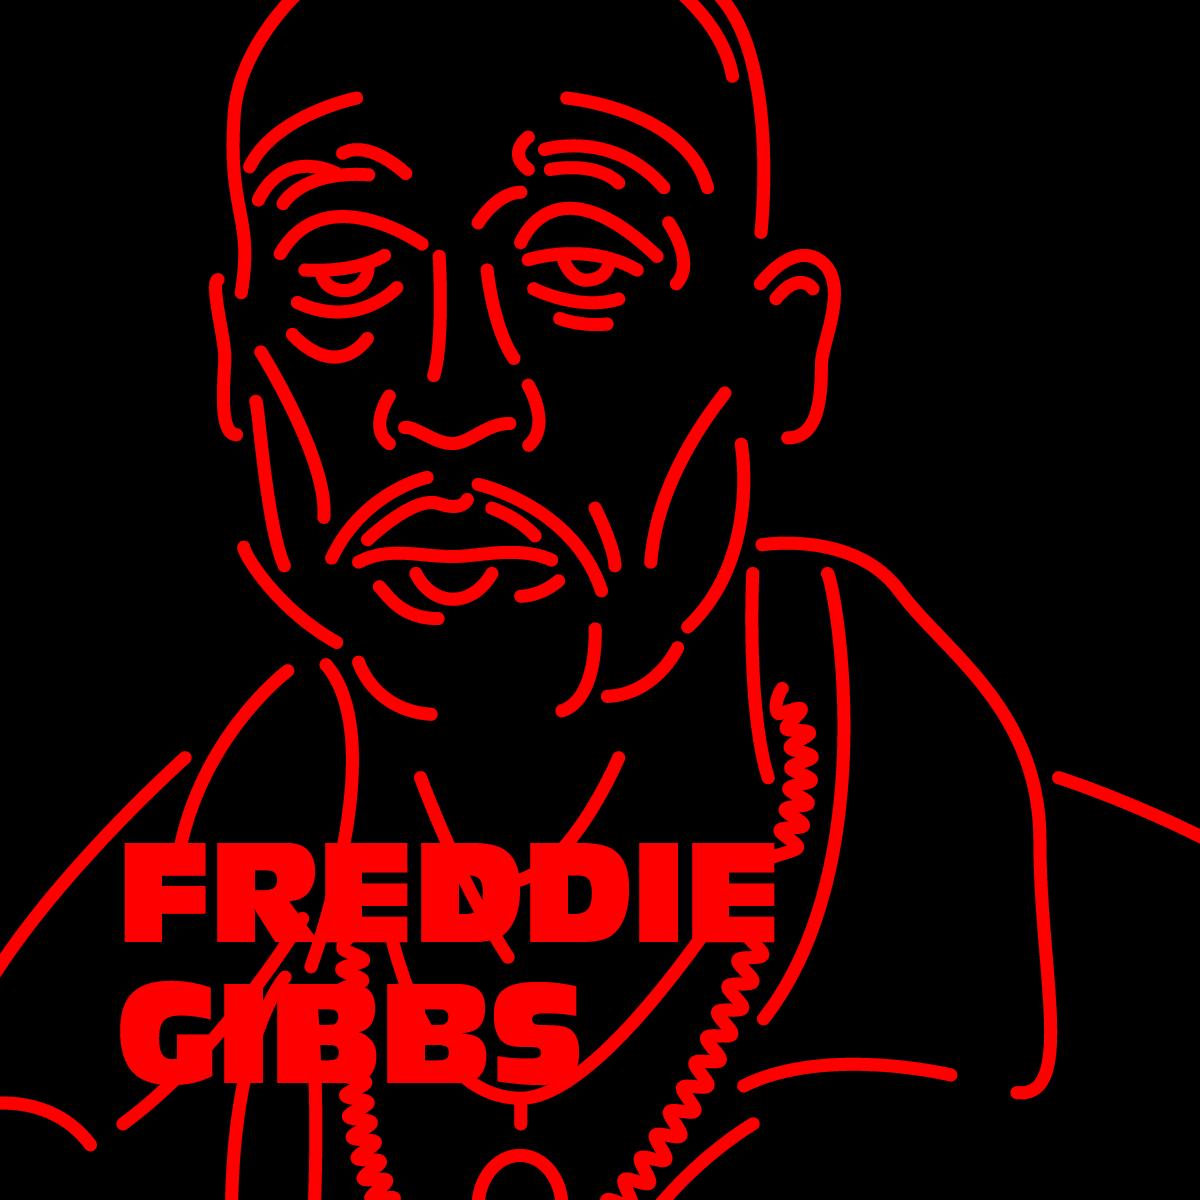 Freddie Gibbs zamyka line-up HHK 2019